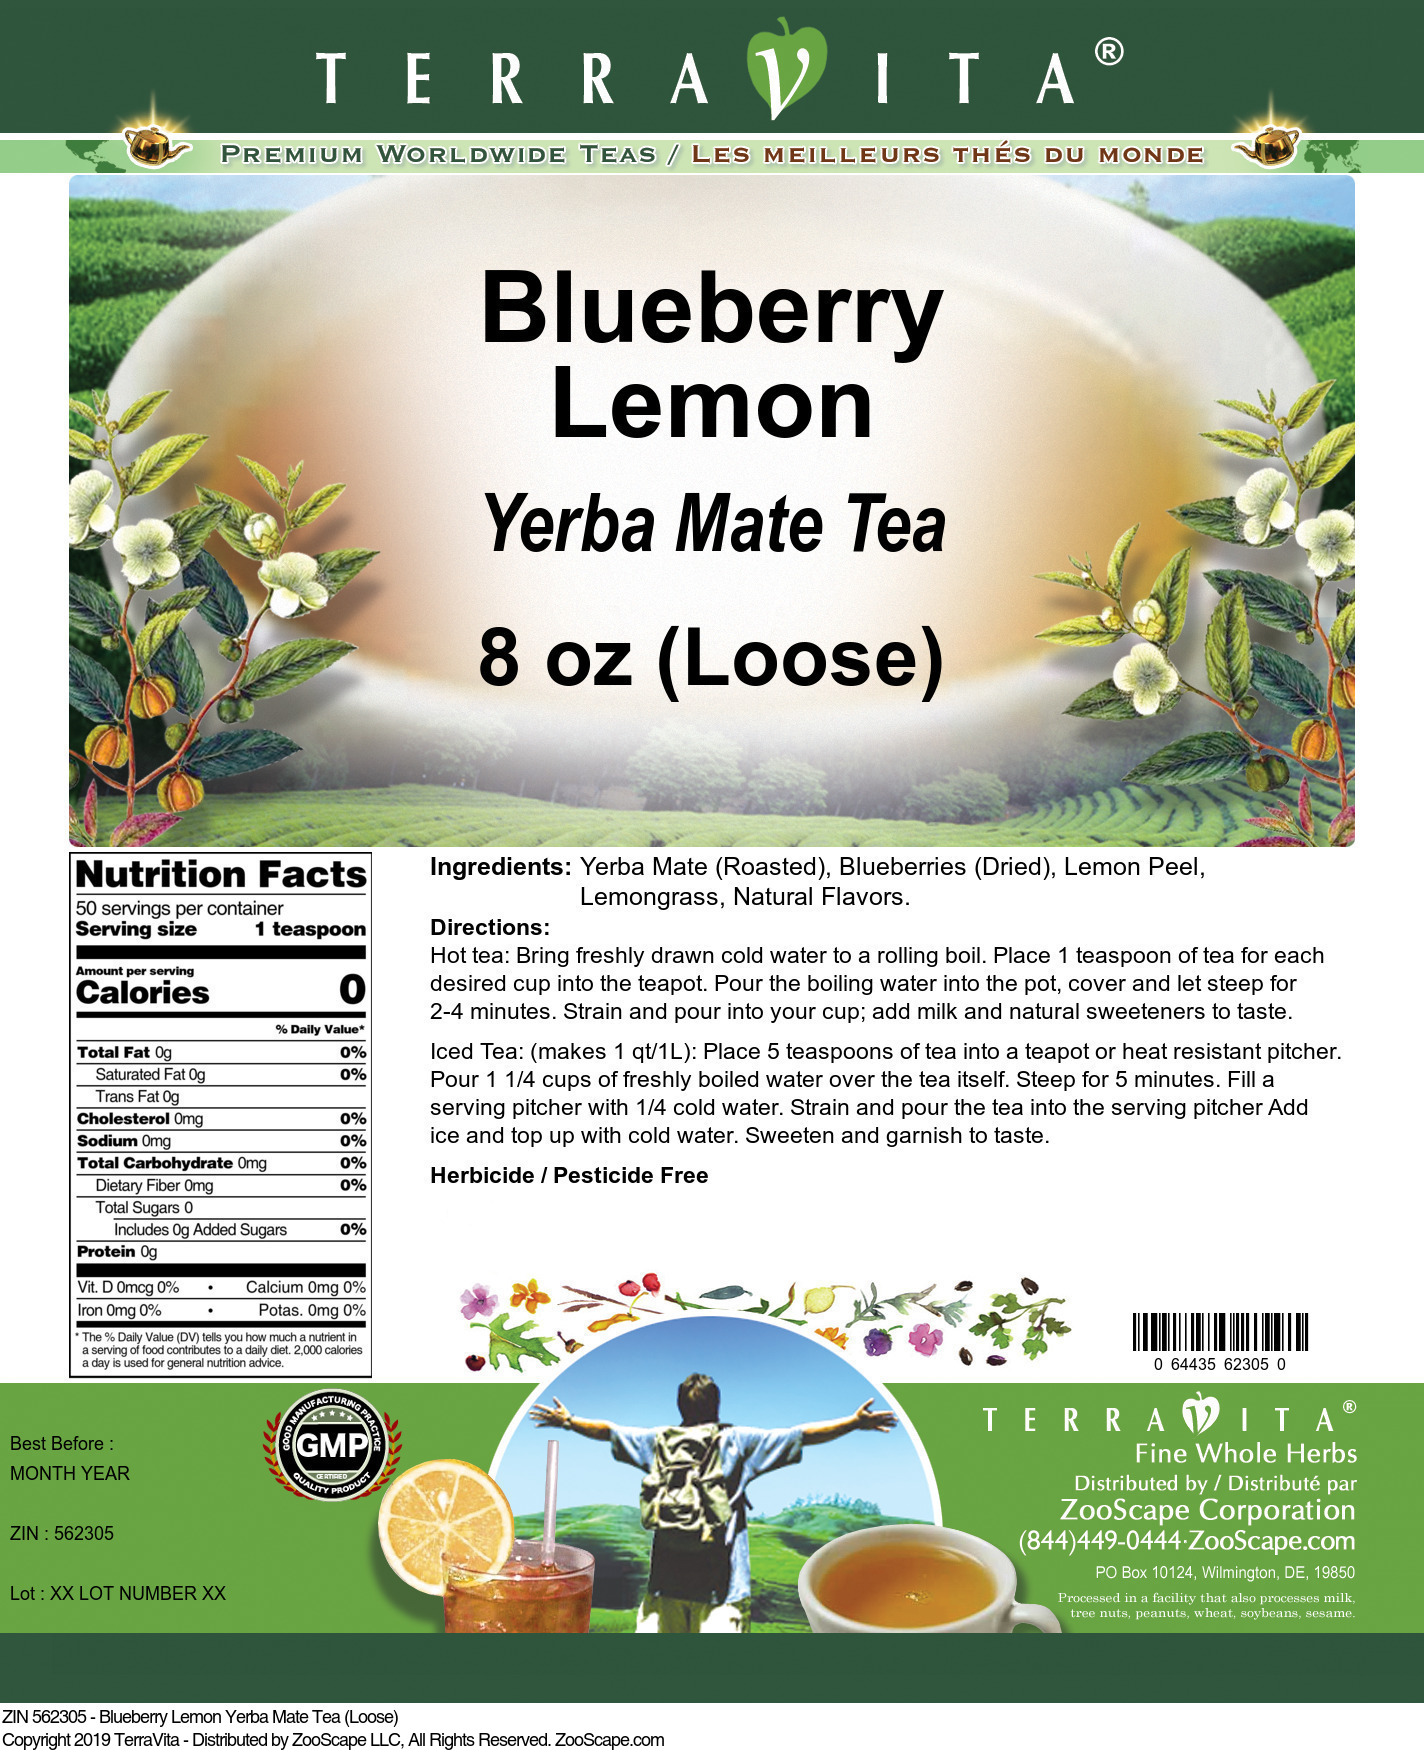 Blueberry Lemon Yerba Mate Tea (Loose)